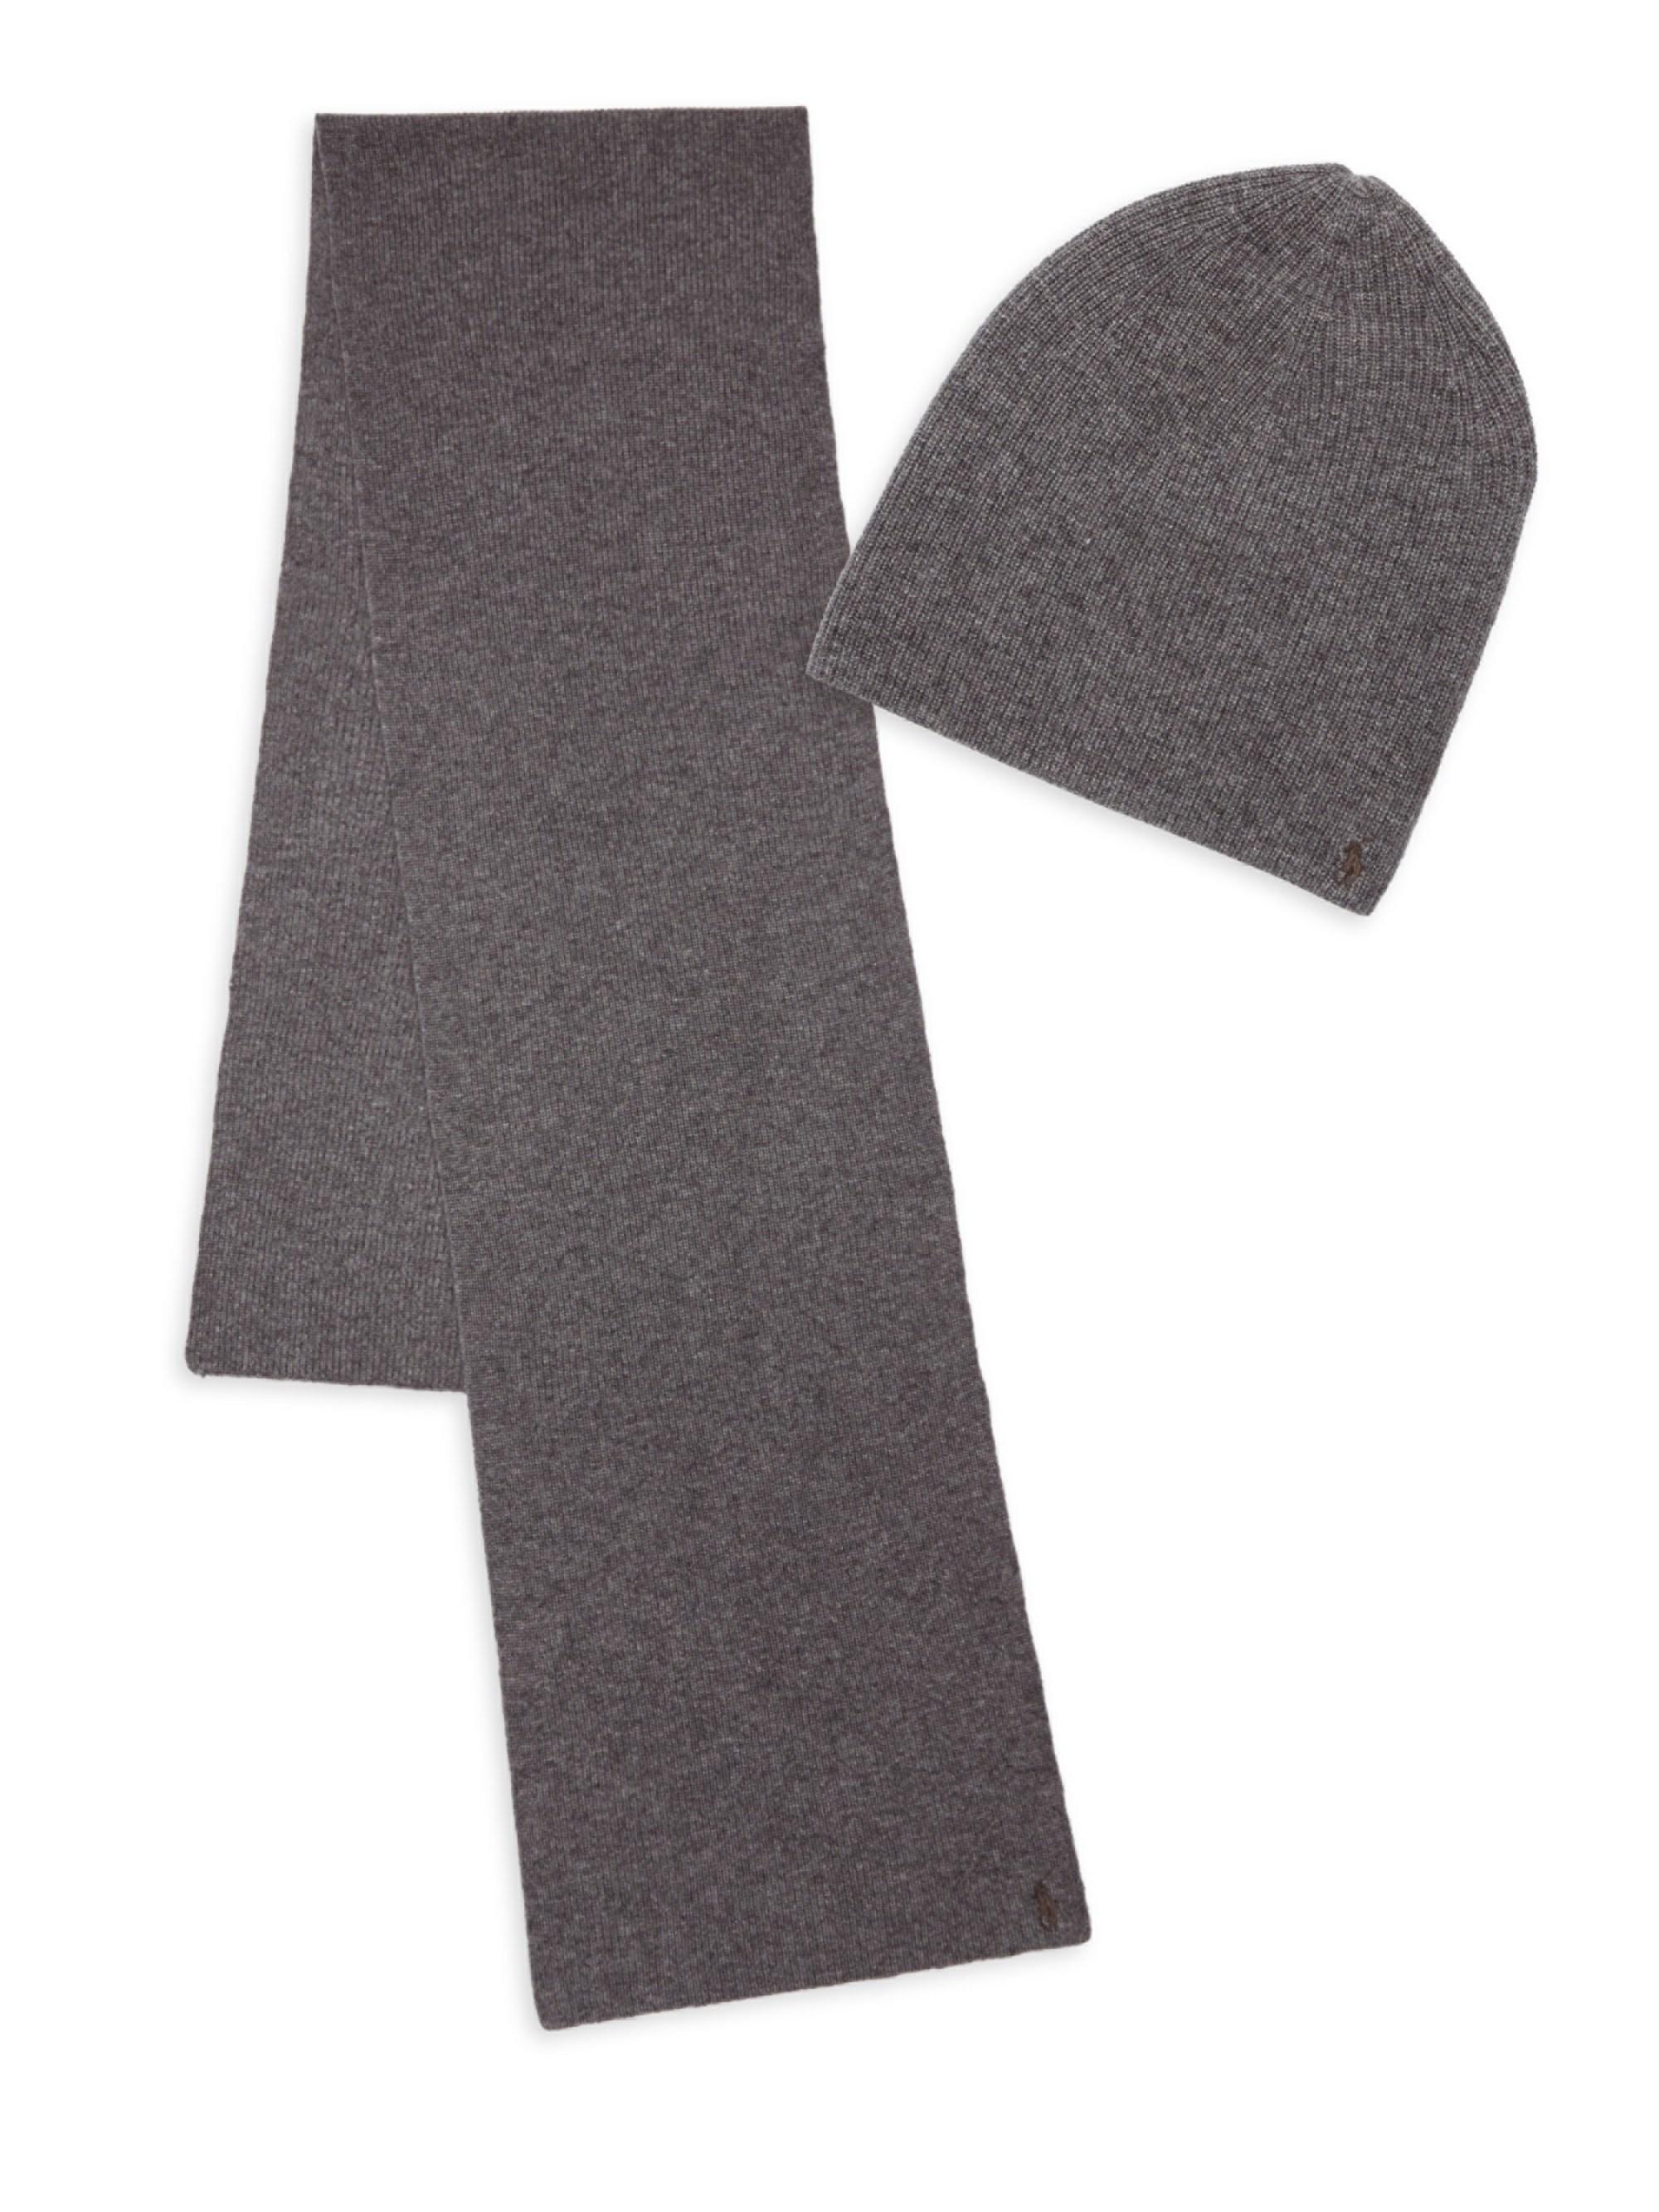 3df6c9f7c87 Lyst - Polo Ralph Lauren Cashmere Blend Hat   Scarf Set in Gray for Men